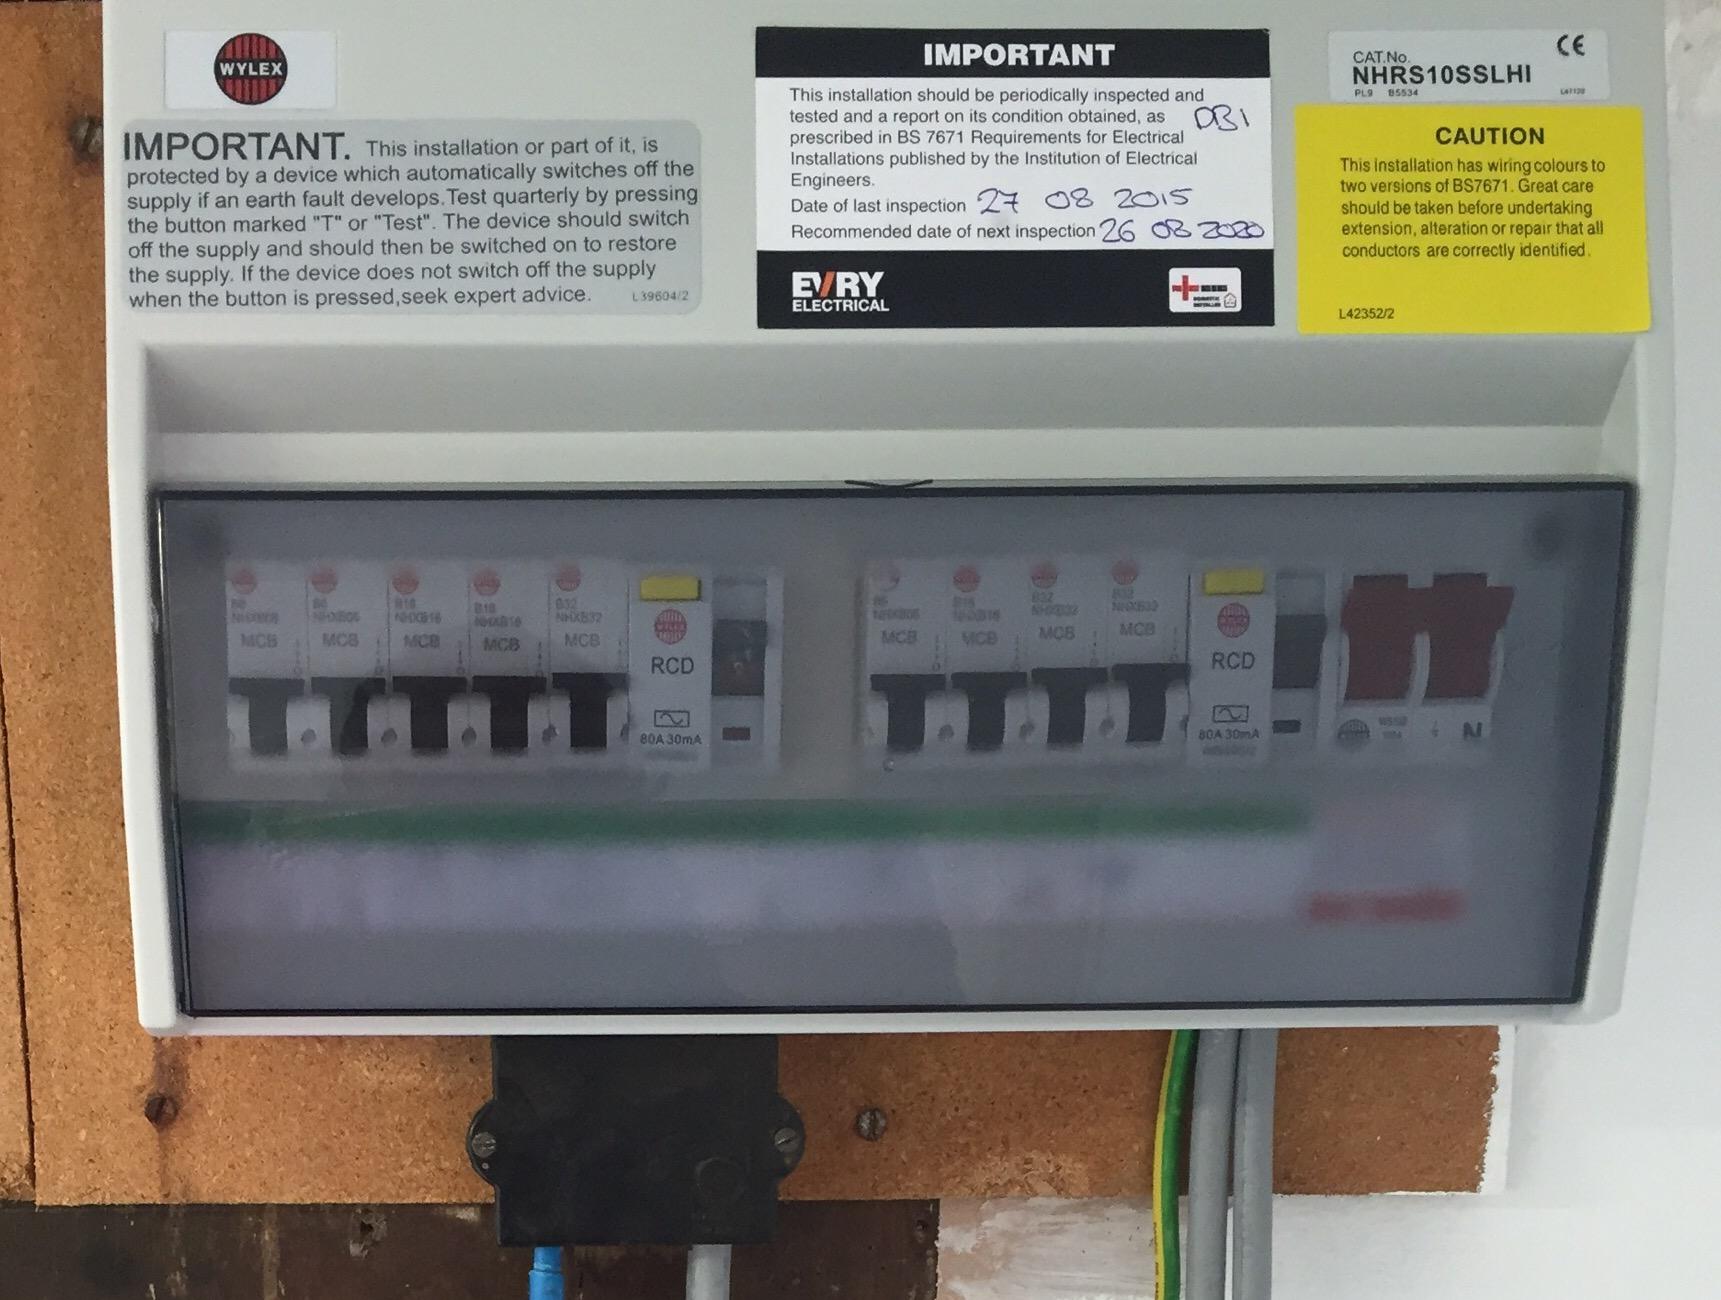 wylex split load consumer unit wiring diagram 2003 dodge ram 1500 ignition hager fuse box generator elsalvadorla